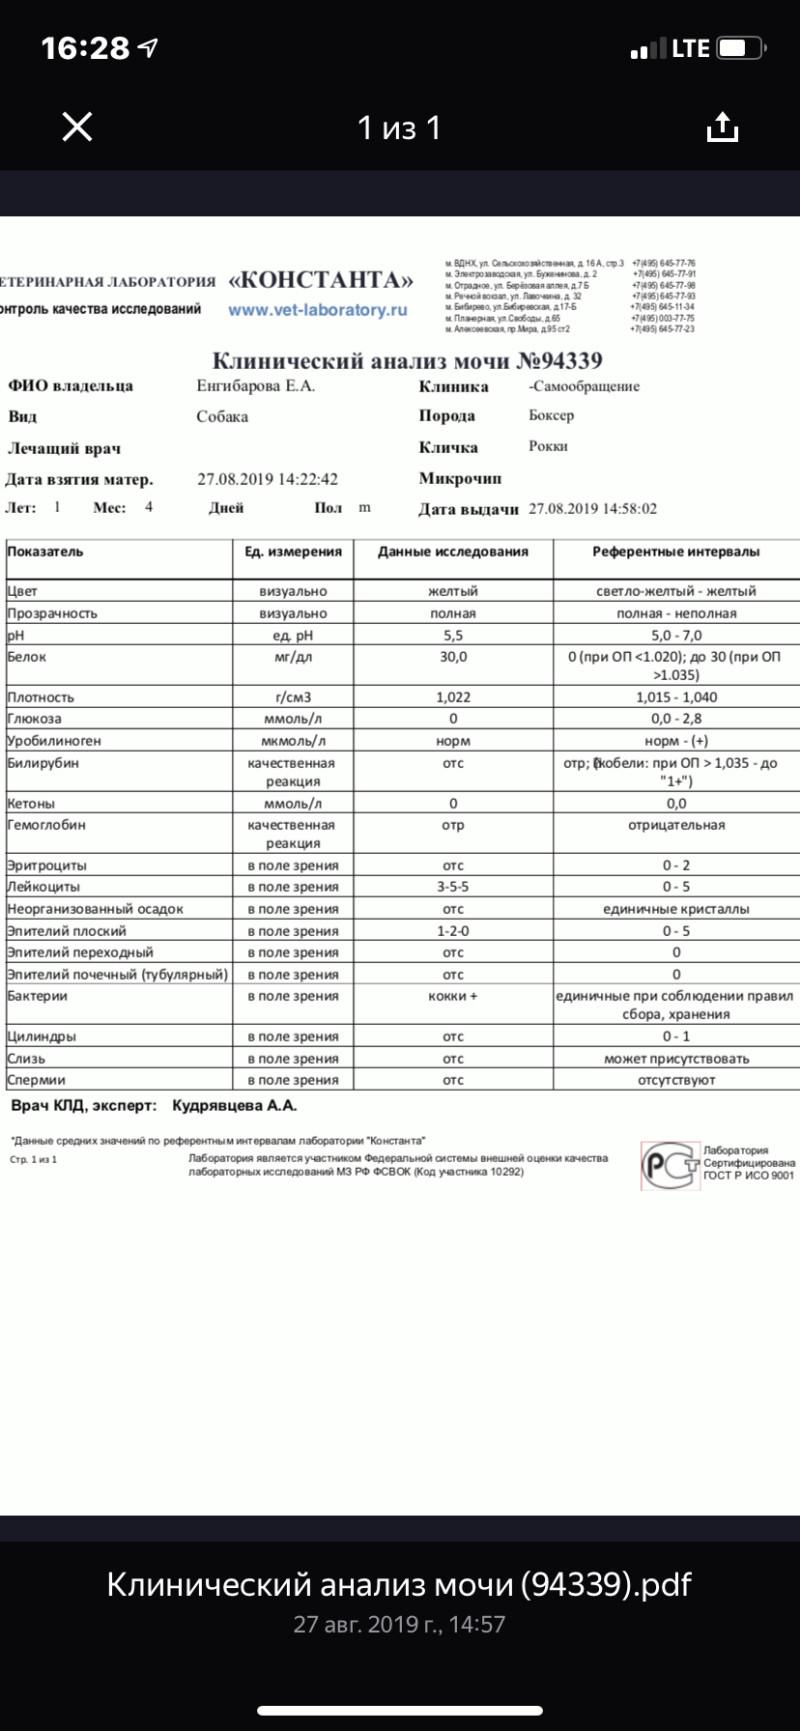 Москва, Ленд Грейп Шеридан, кобель, 24.04.2018 15669110